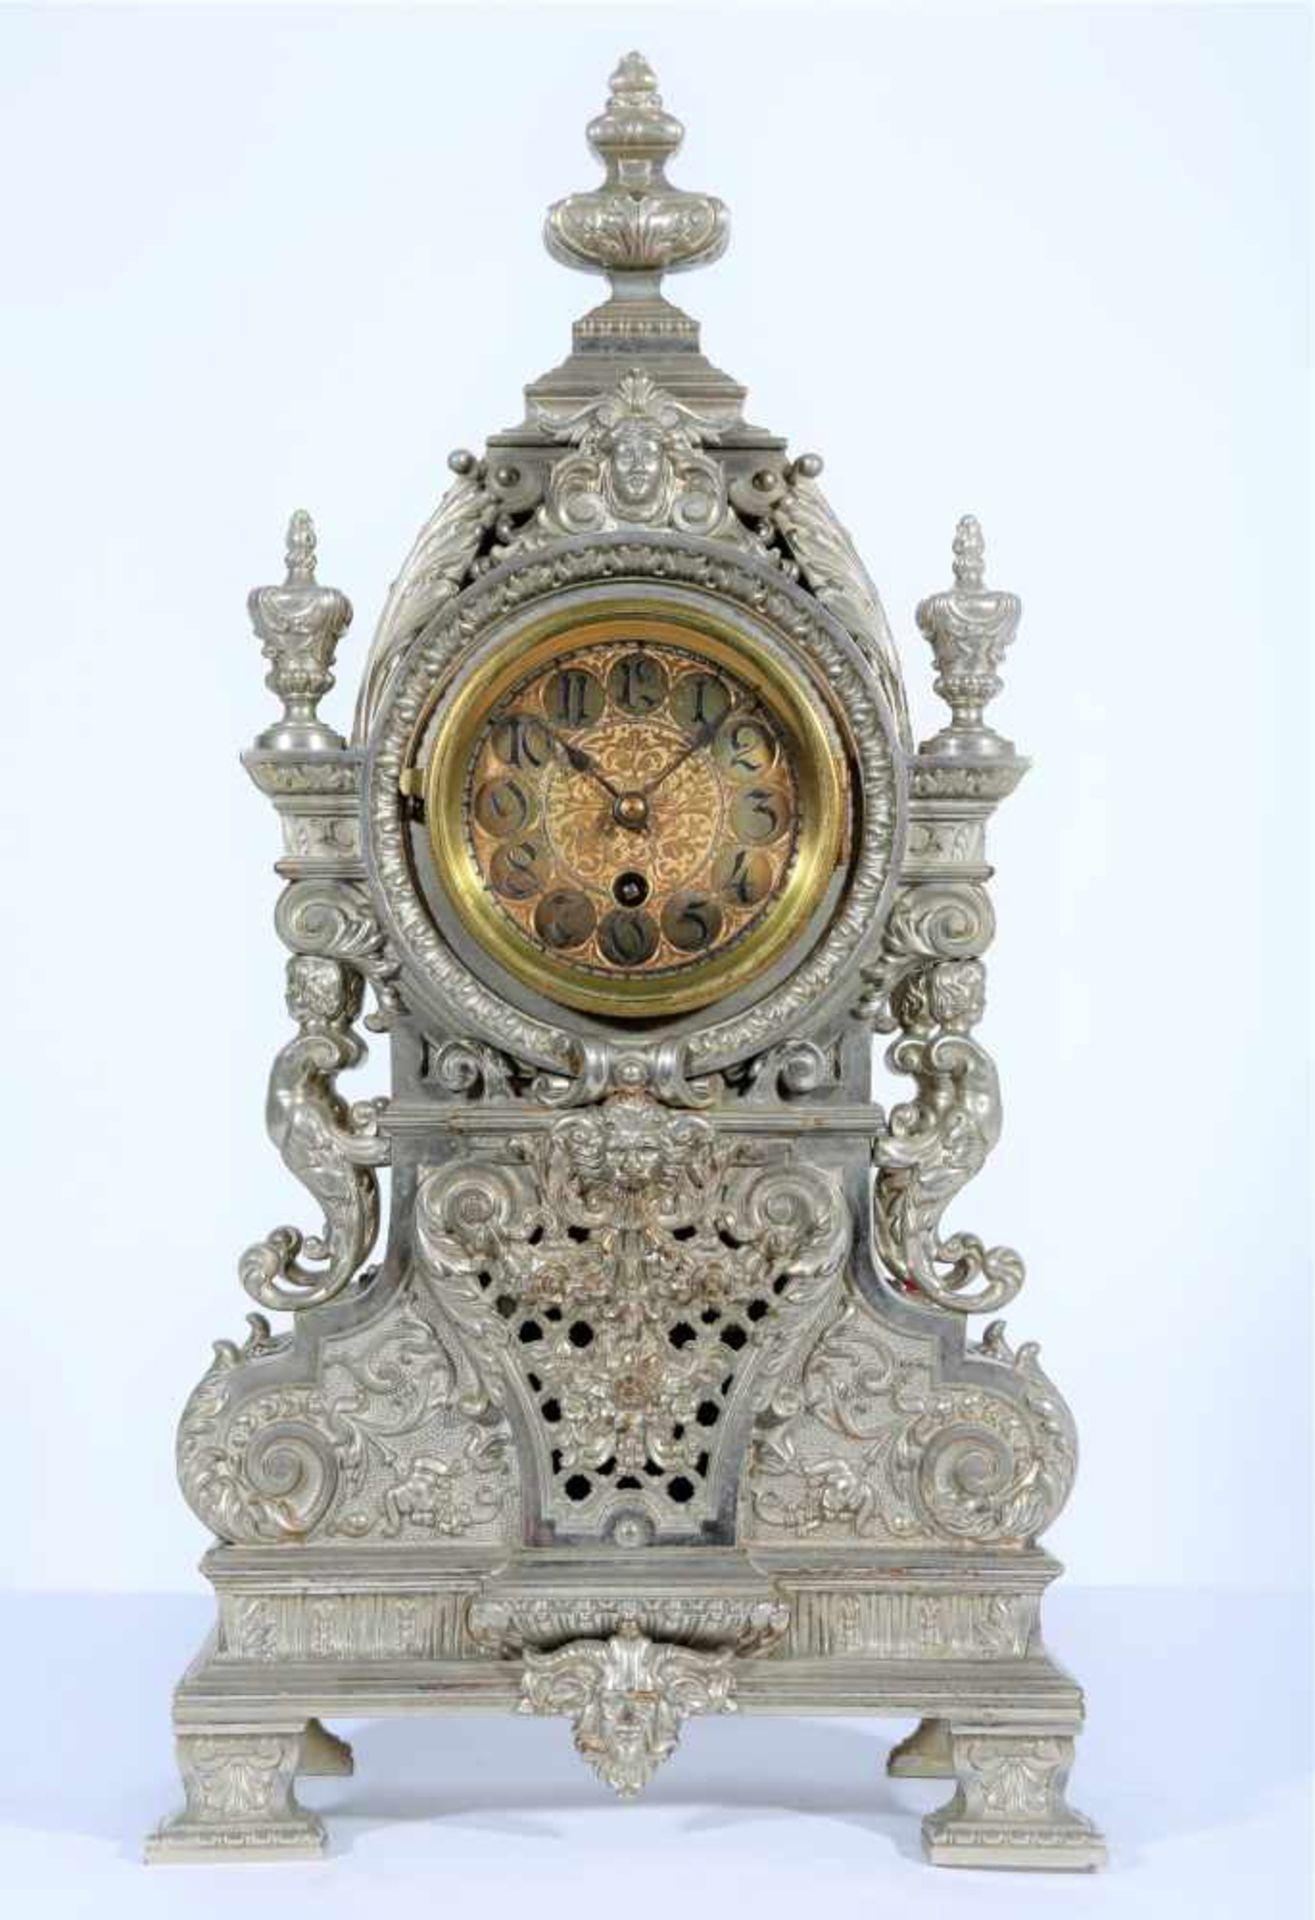 Los 29 - Table Clock - Friedland Austria-Hungary, late 19th century, case art of nickel-iron, marked